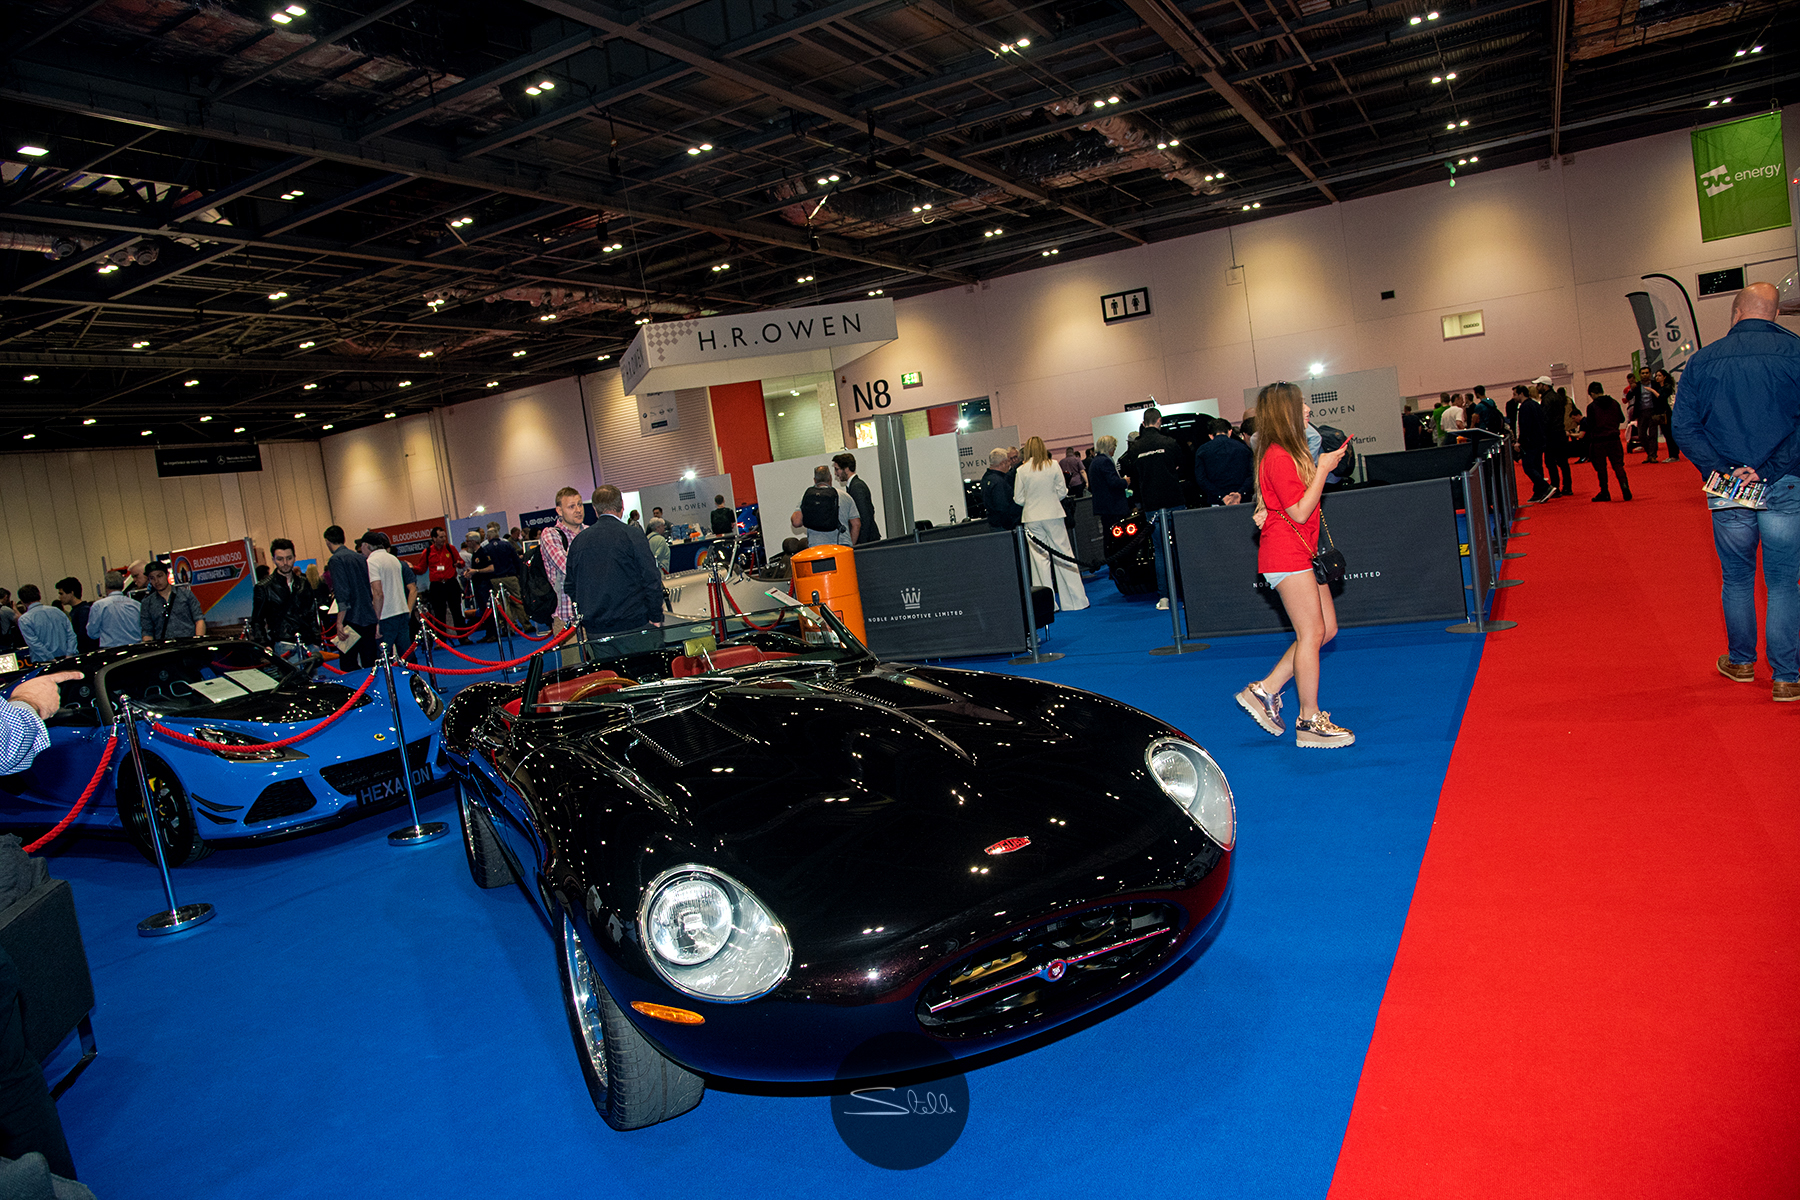 Stella Scordellis The London Motor Show 2018 55 Watermarked.jpg